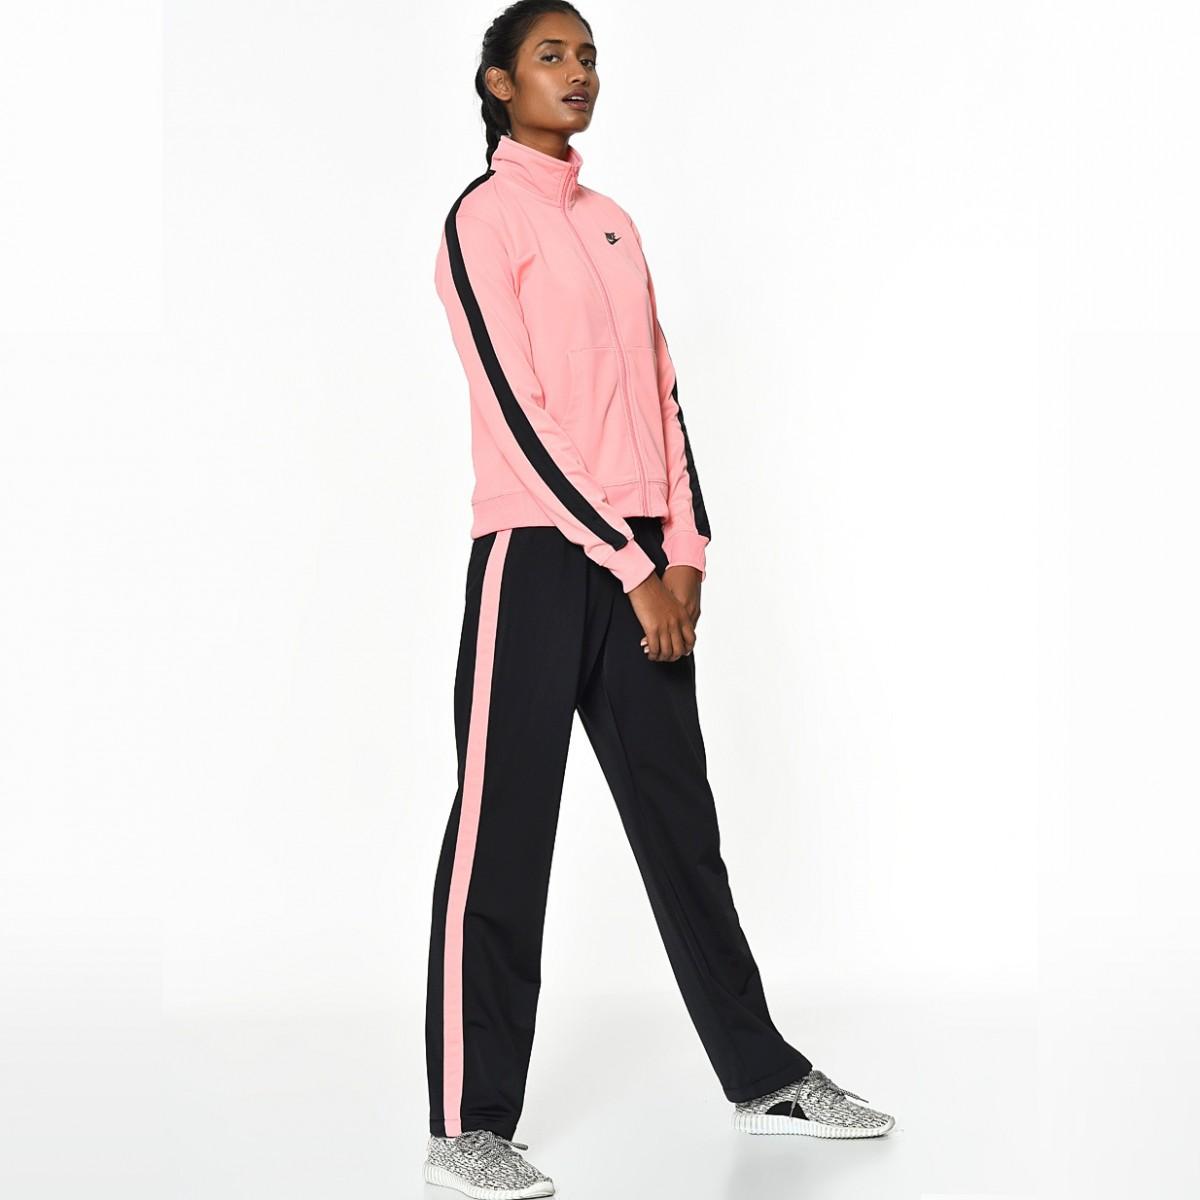 Bizz Store - Agasalho Feminino Nike Suit Esportivo 75553228fb1